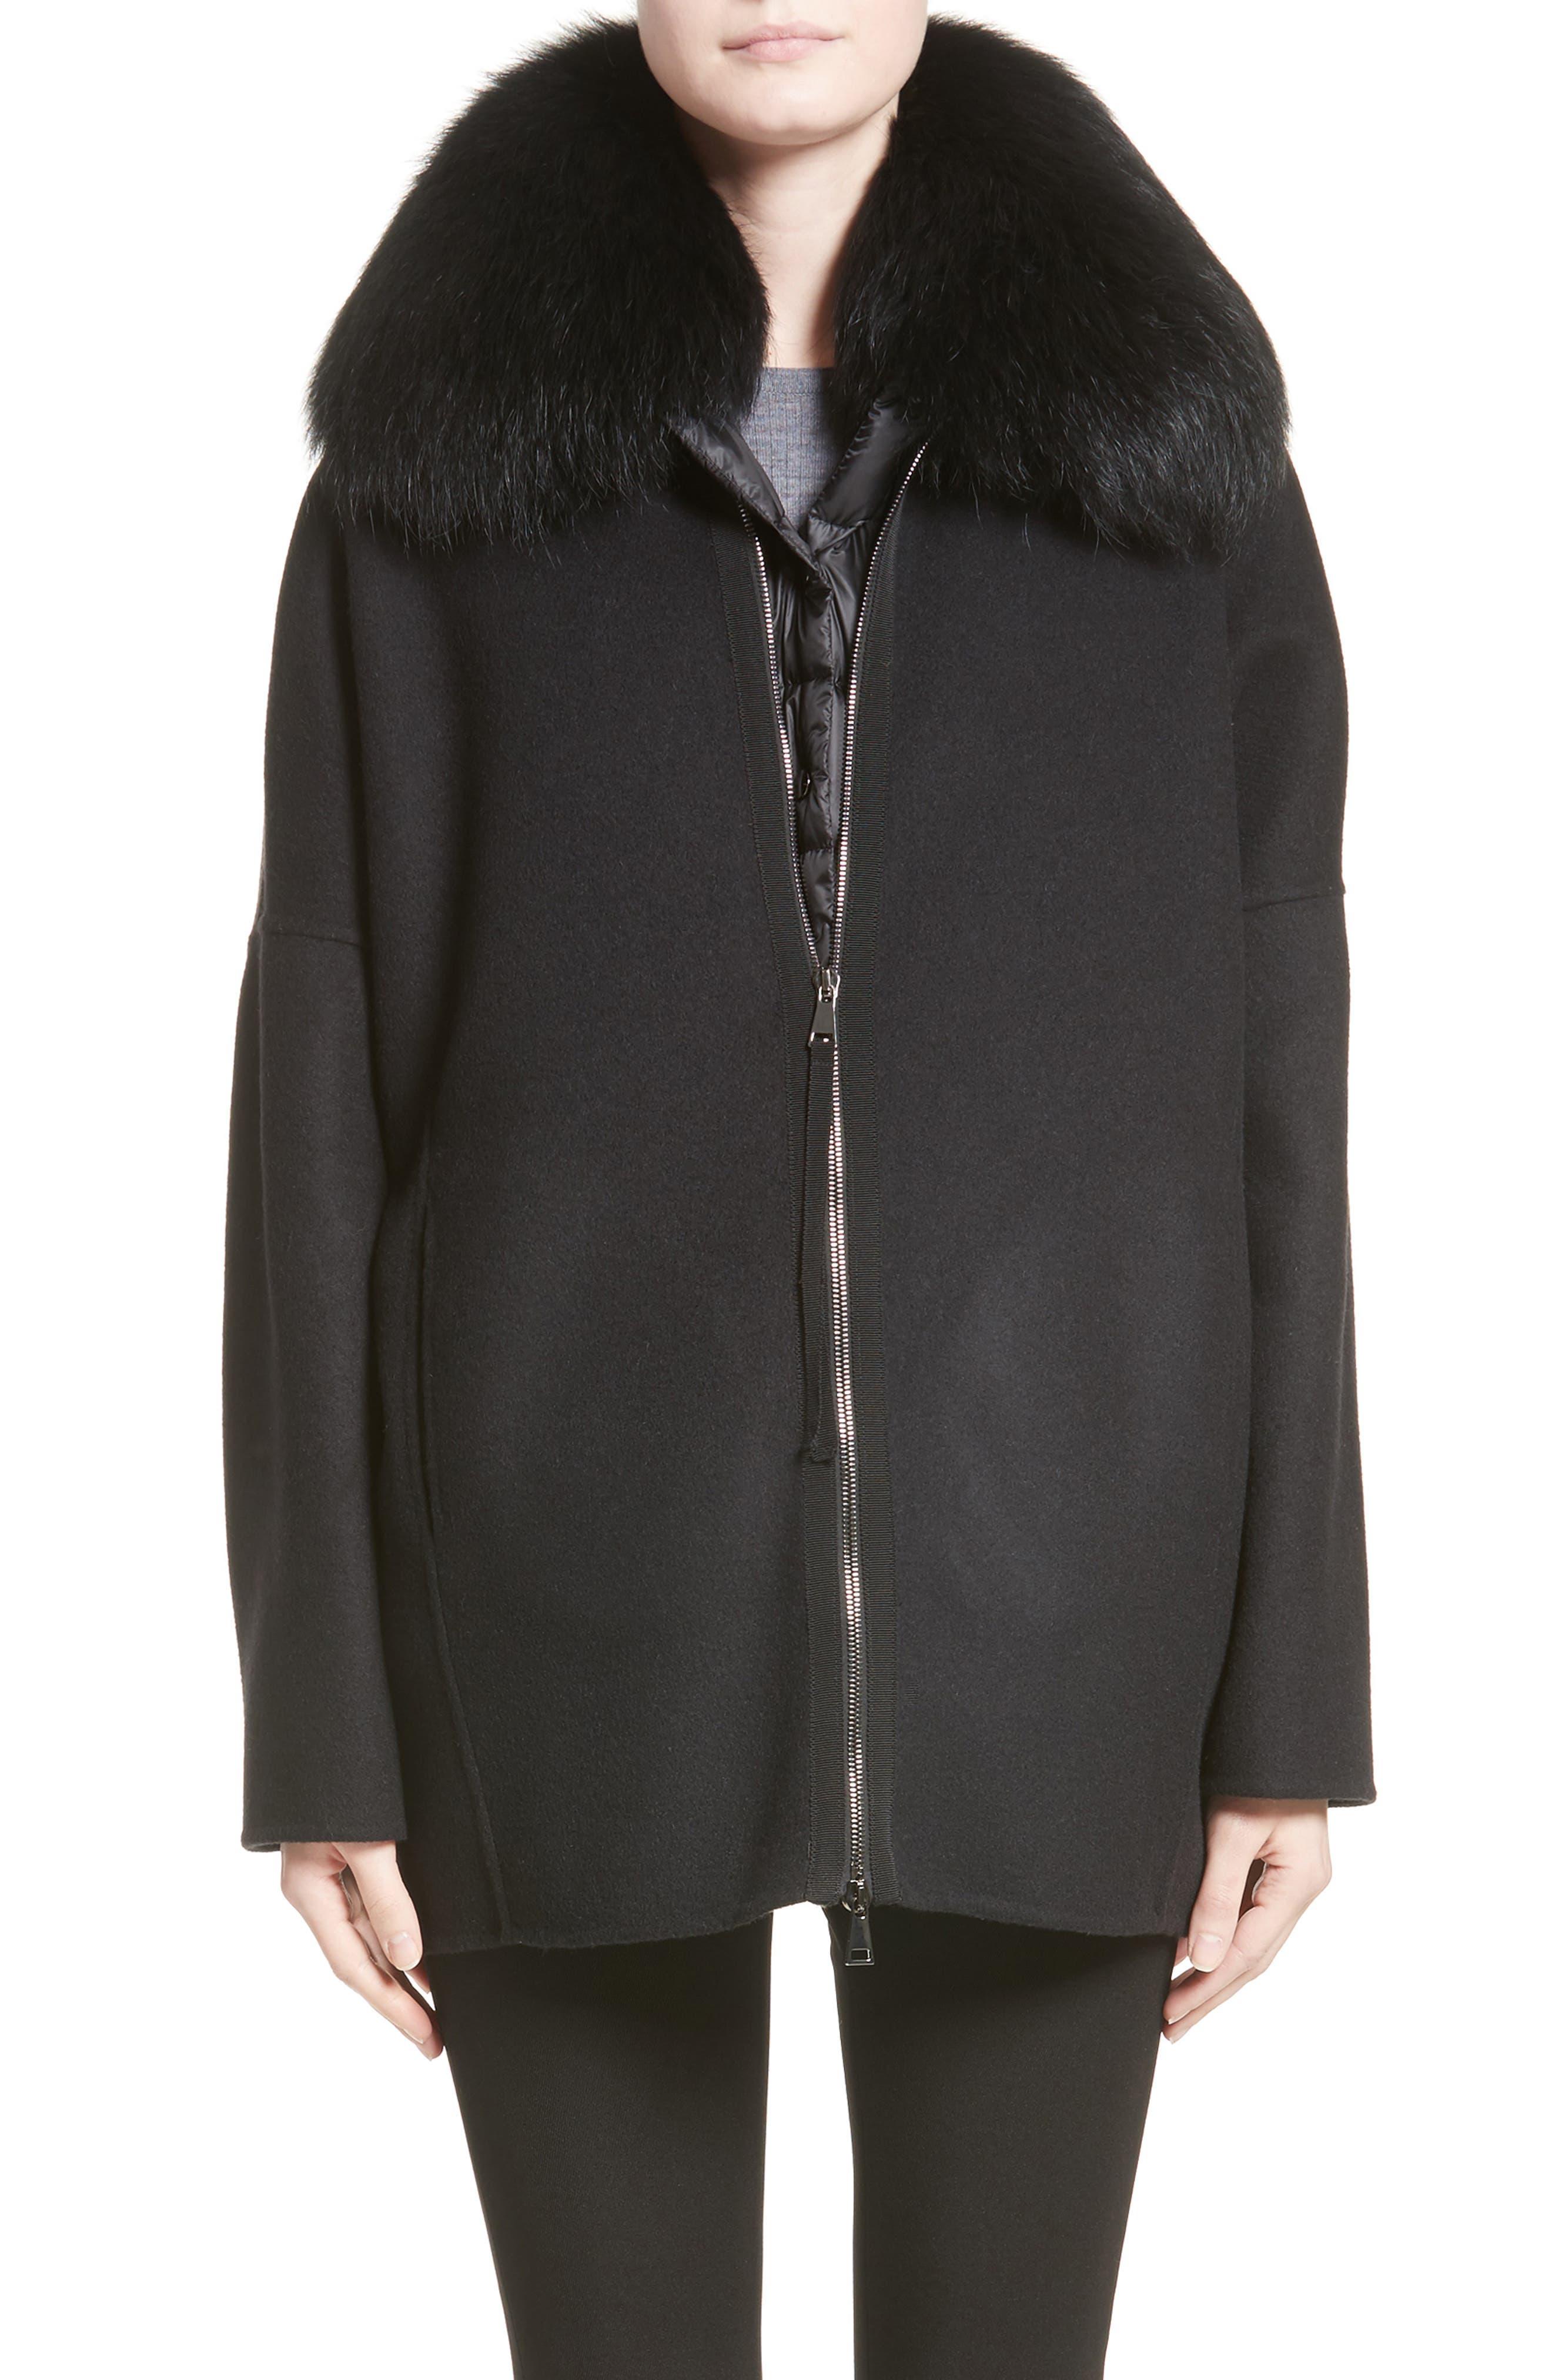 Buxus Wool & Cashmere Coat with Removable Genuine Fox Fur Trim Vest,                         Main,                         color, 001